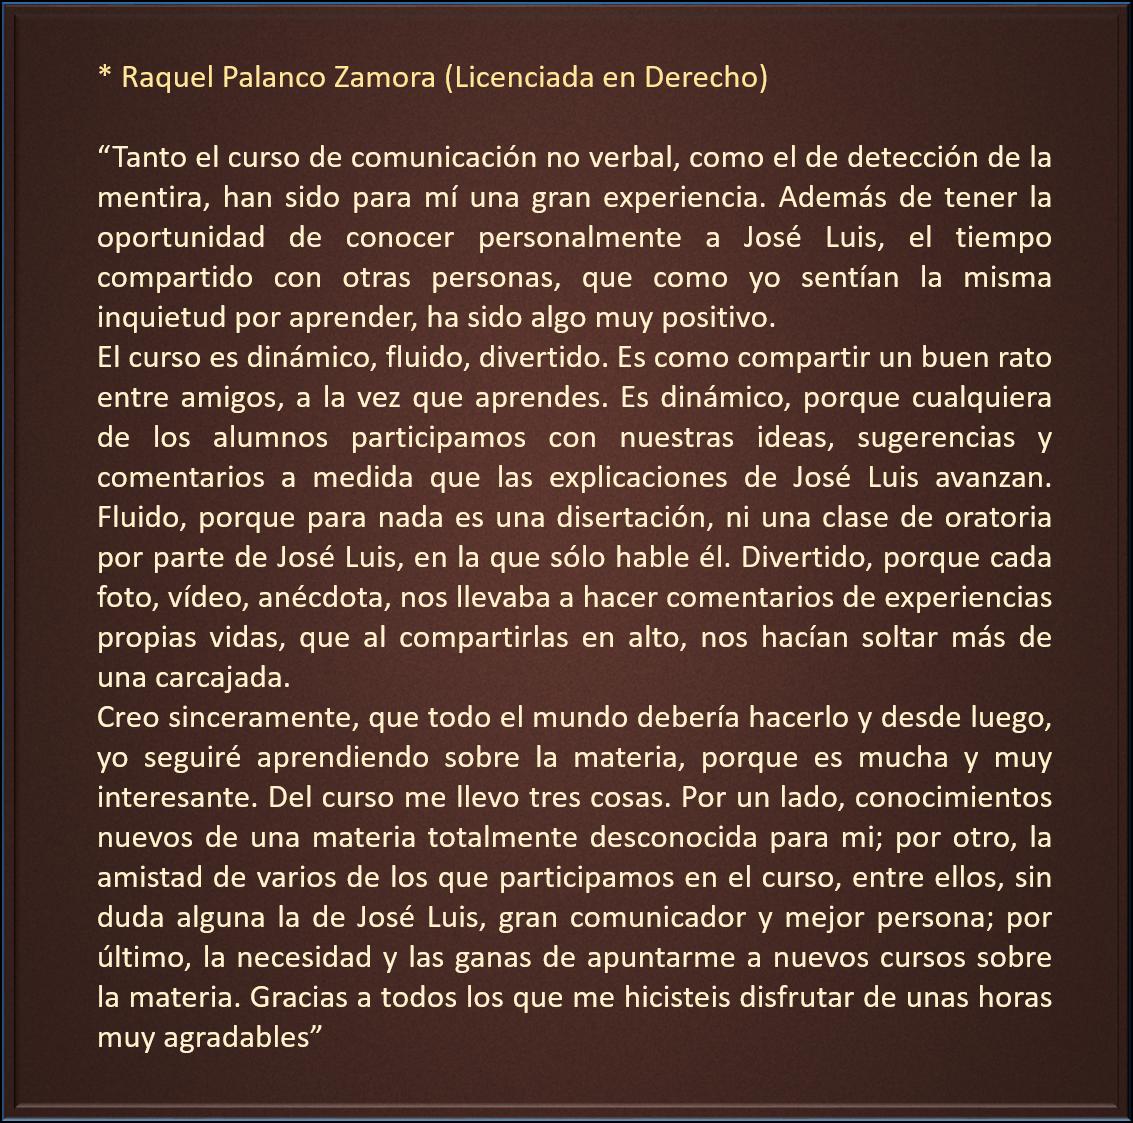 Raquel Palanco